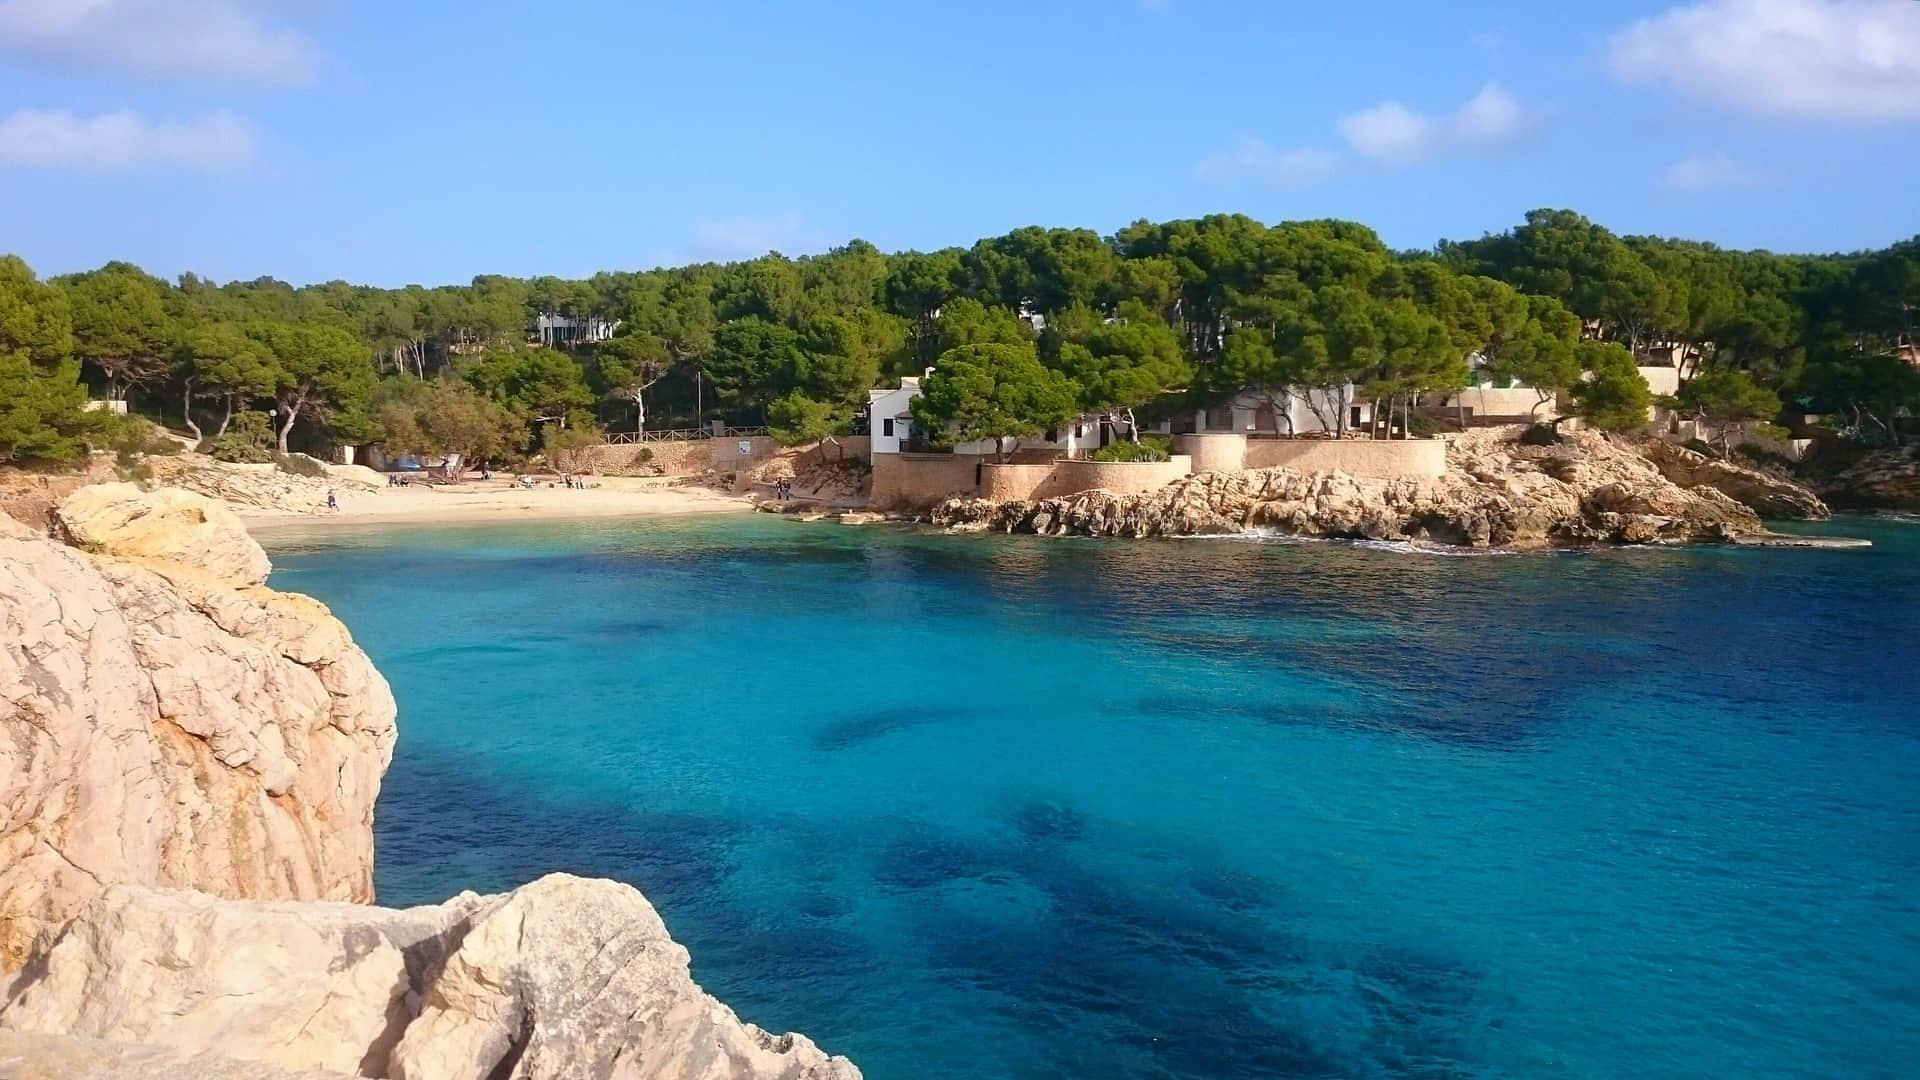 Flug München - Mallorca nur 9,45€ 94% billiger im September Mallorca Urlaub